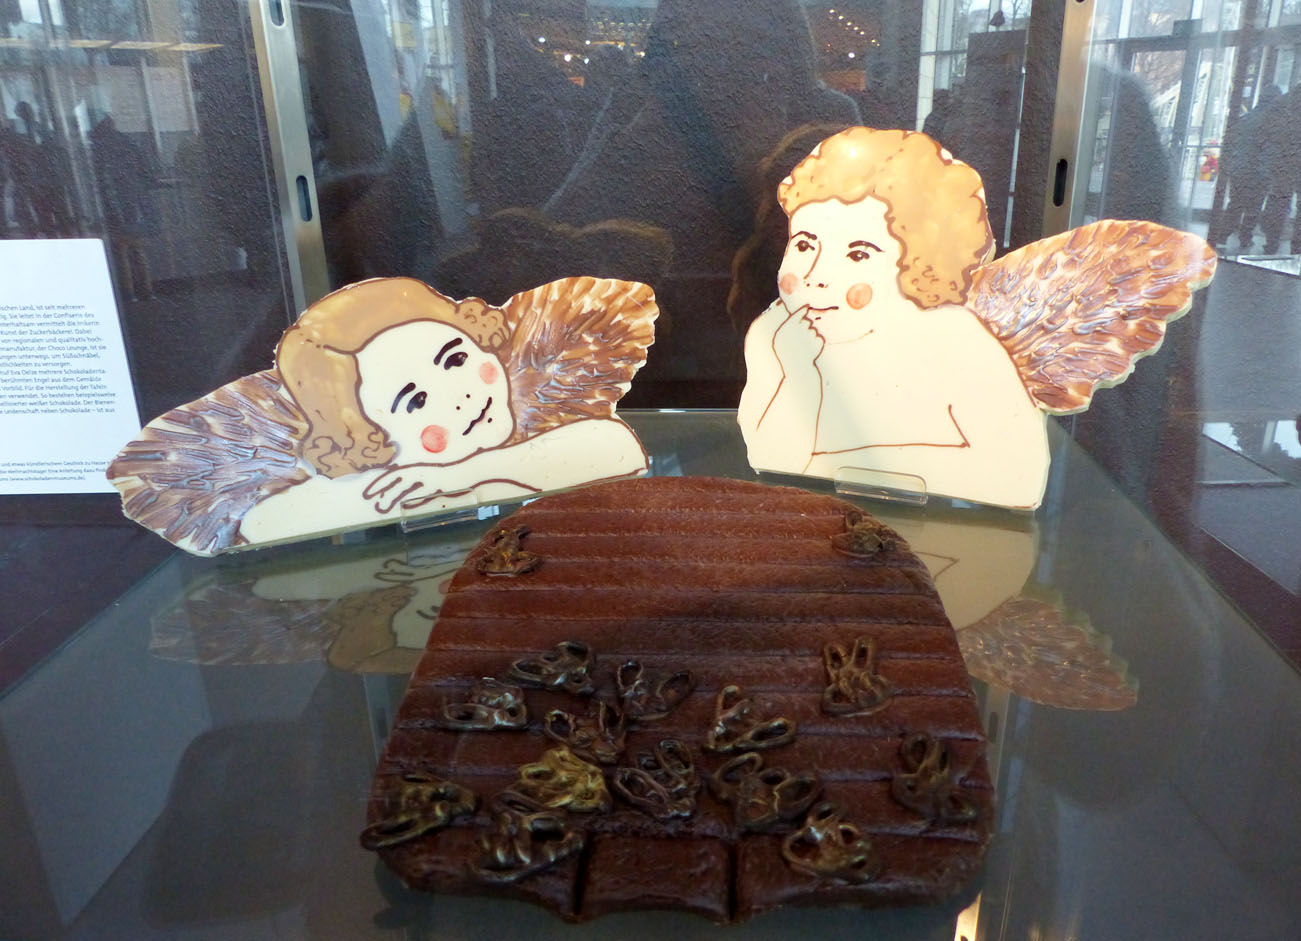 aa10e57b4e5e91 Himmlisch schokoladig! – Zu Besuch im Schokoladenmuseum in Köln ...